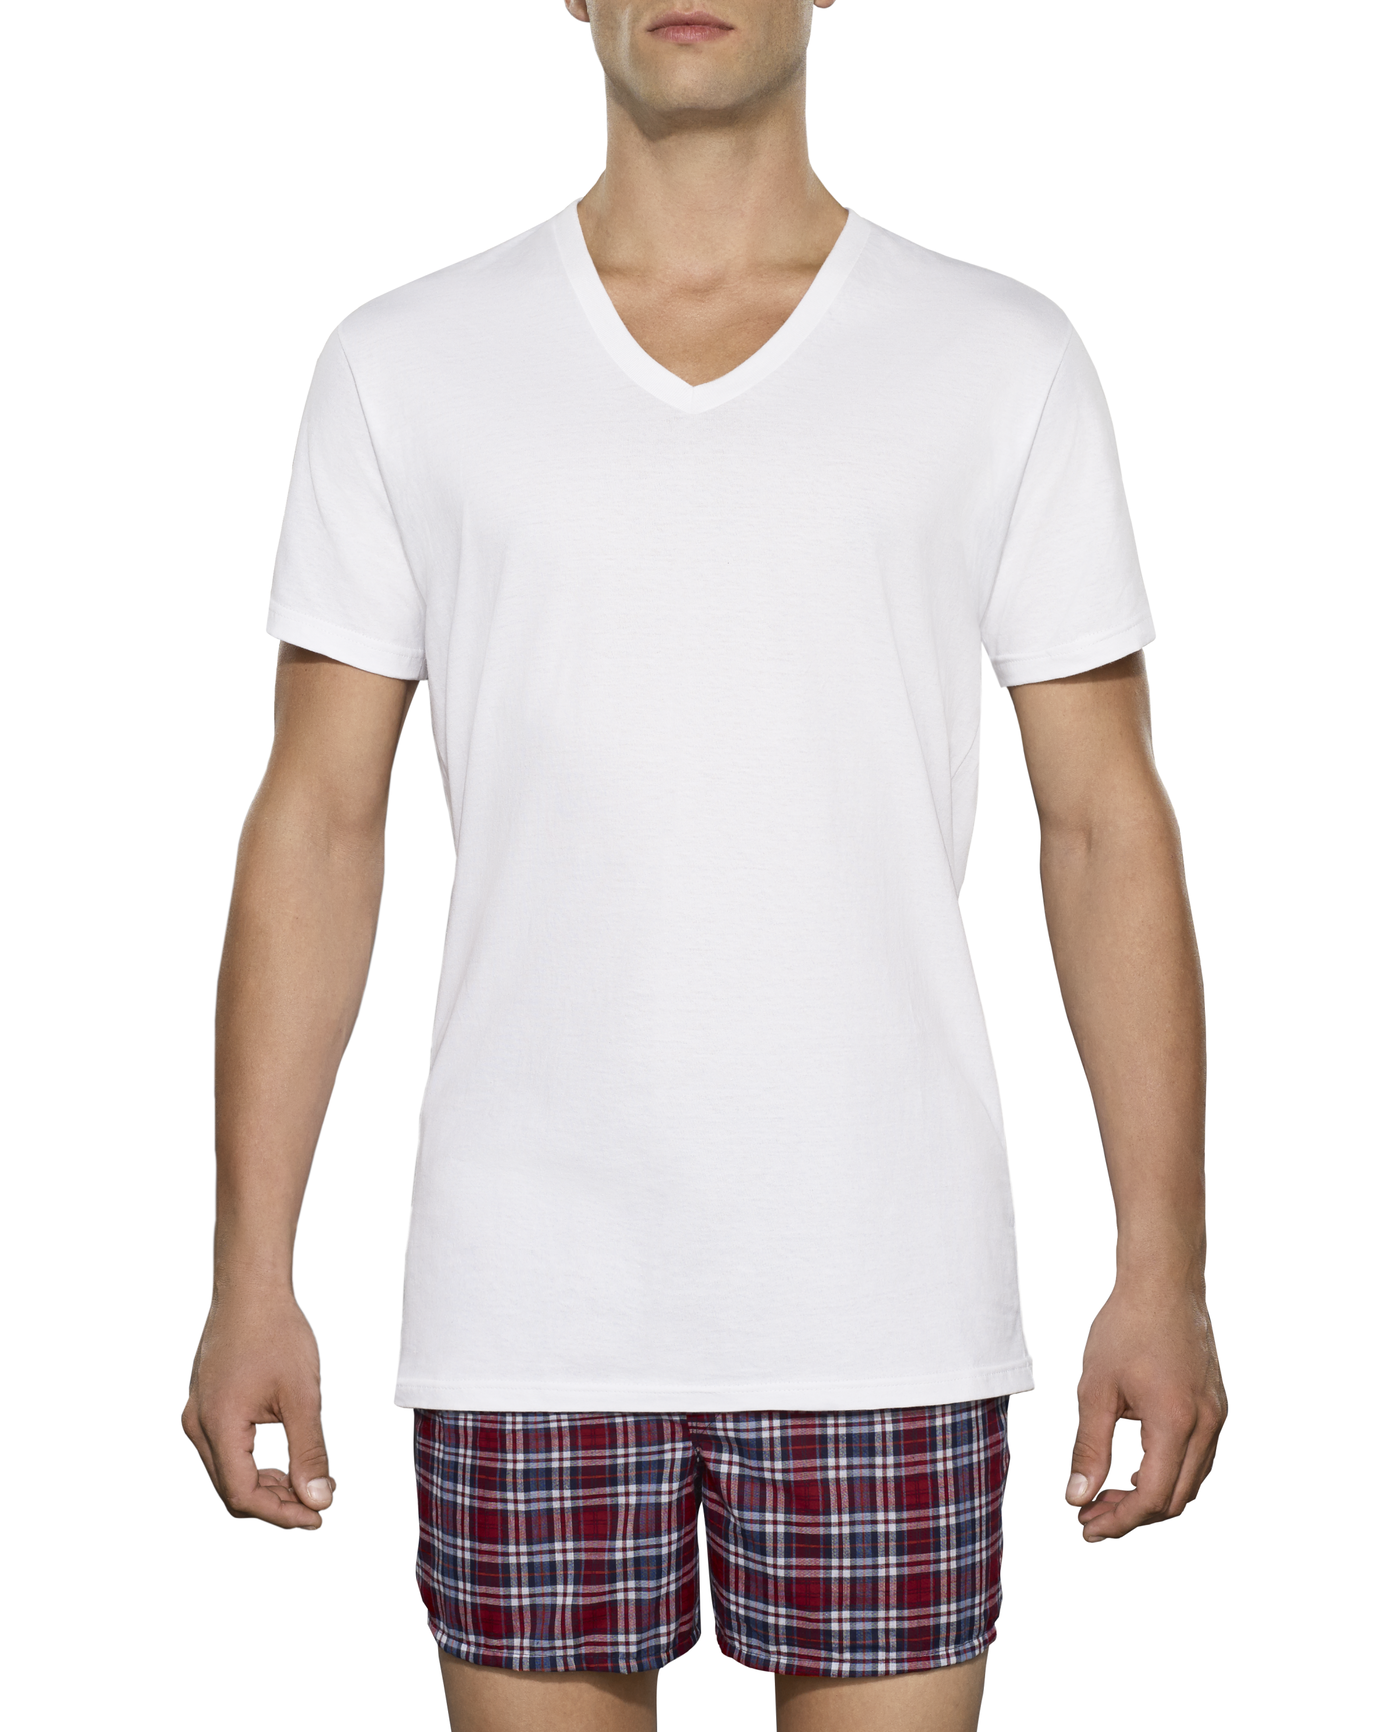 027ee556da9 Men s 3 Pack Tall Man V Neck T-Shirt - Fruit US